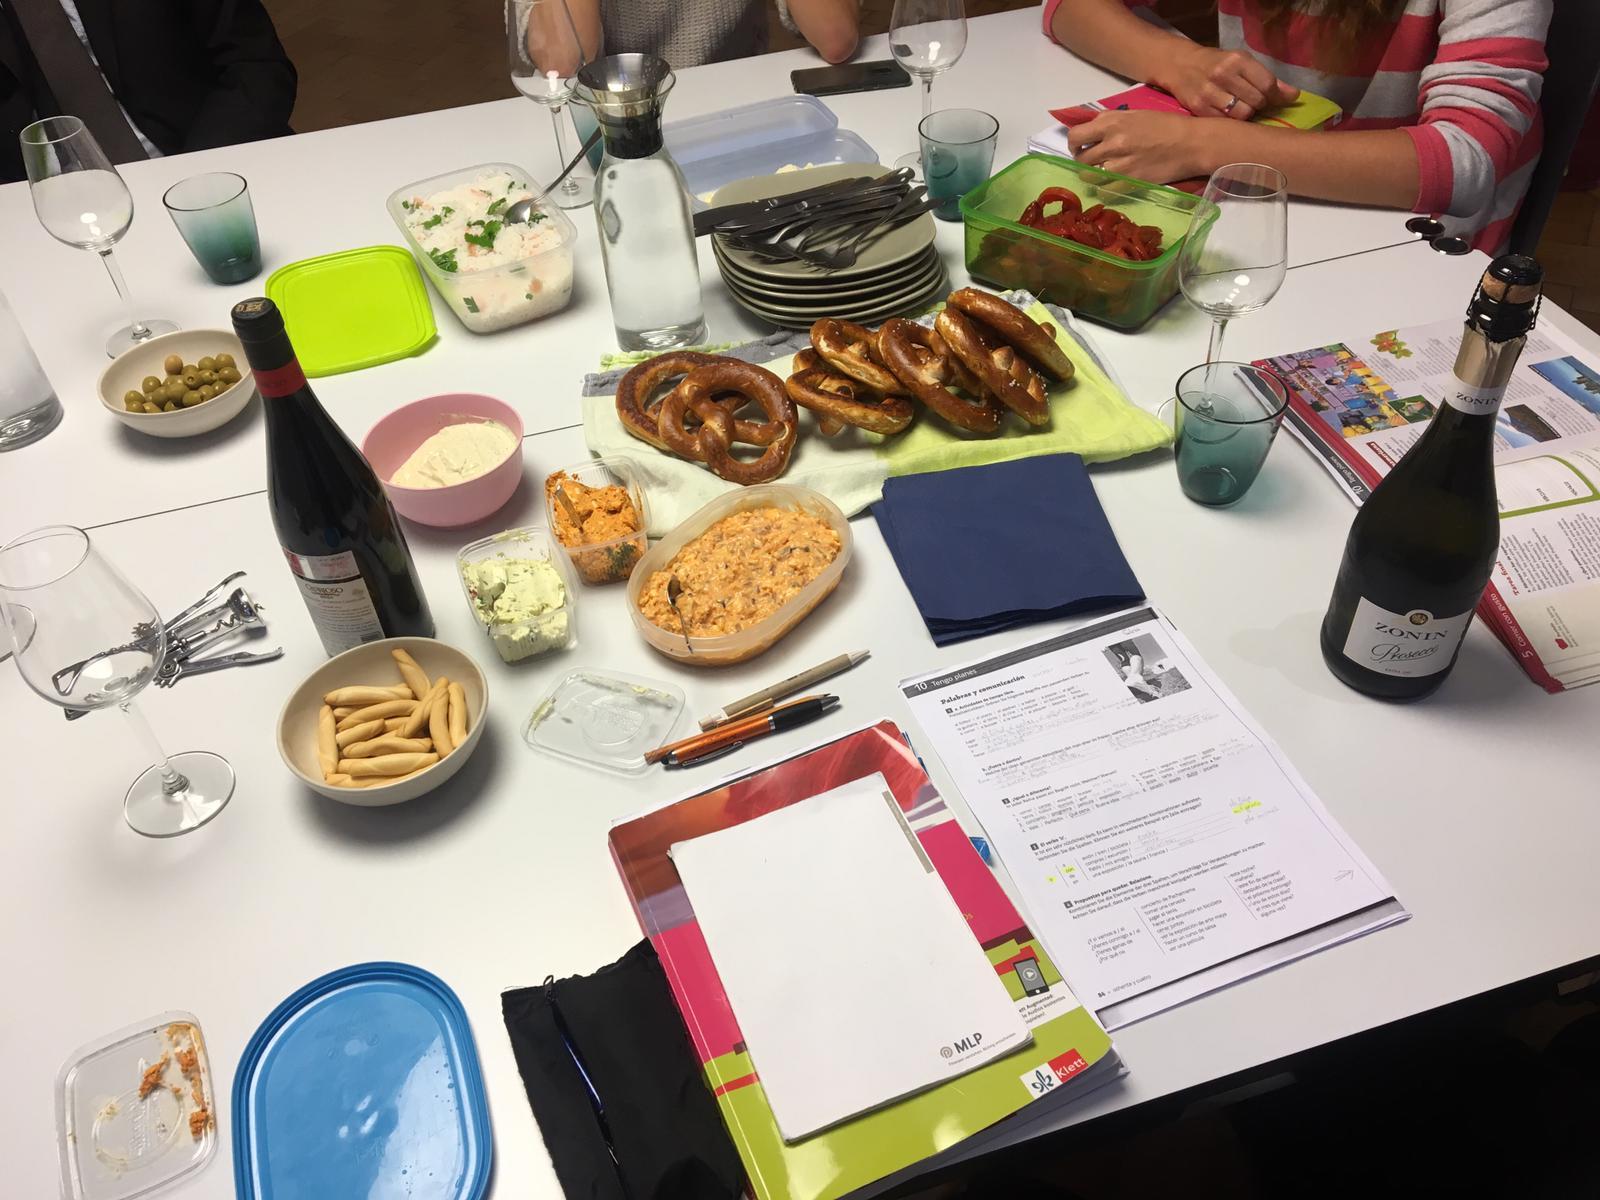 Spanisch essen bei LenguaViva